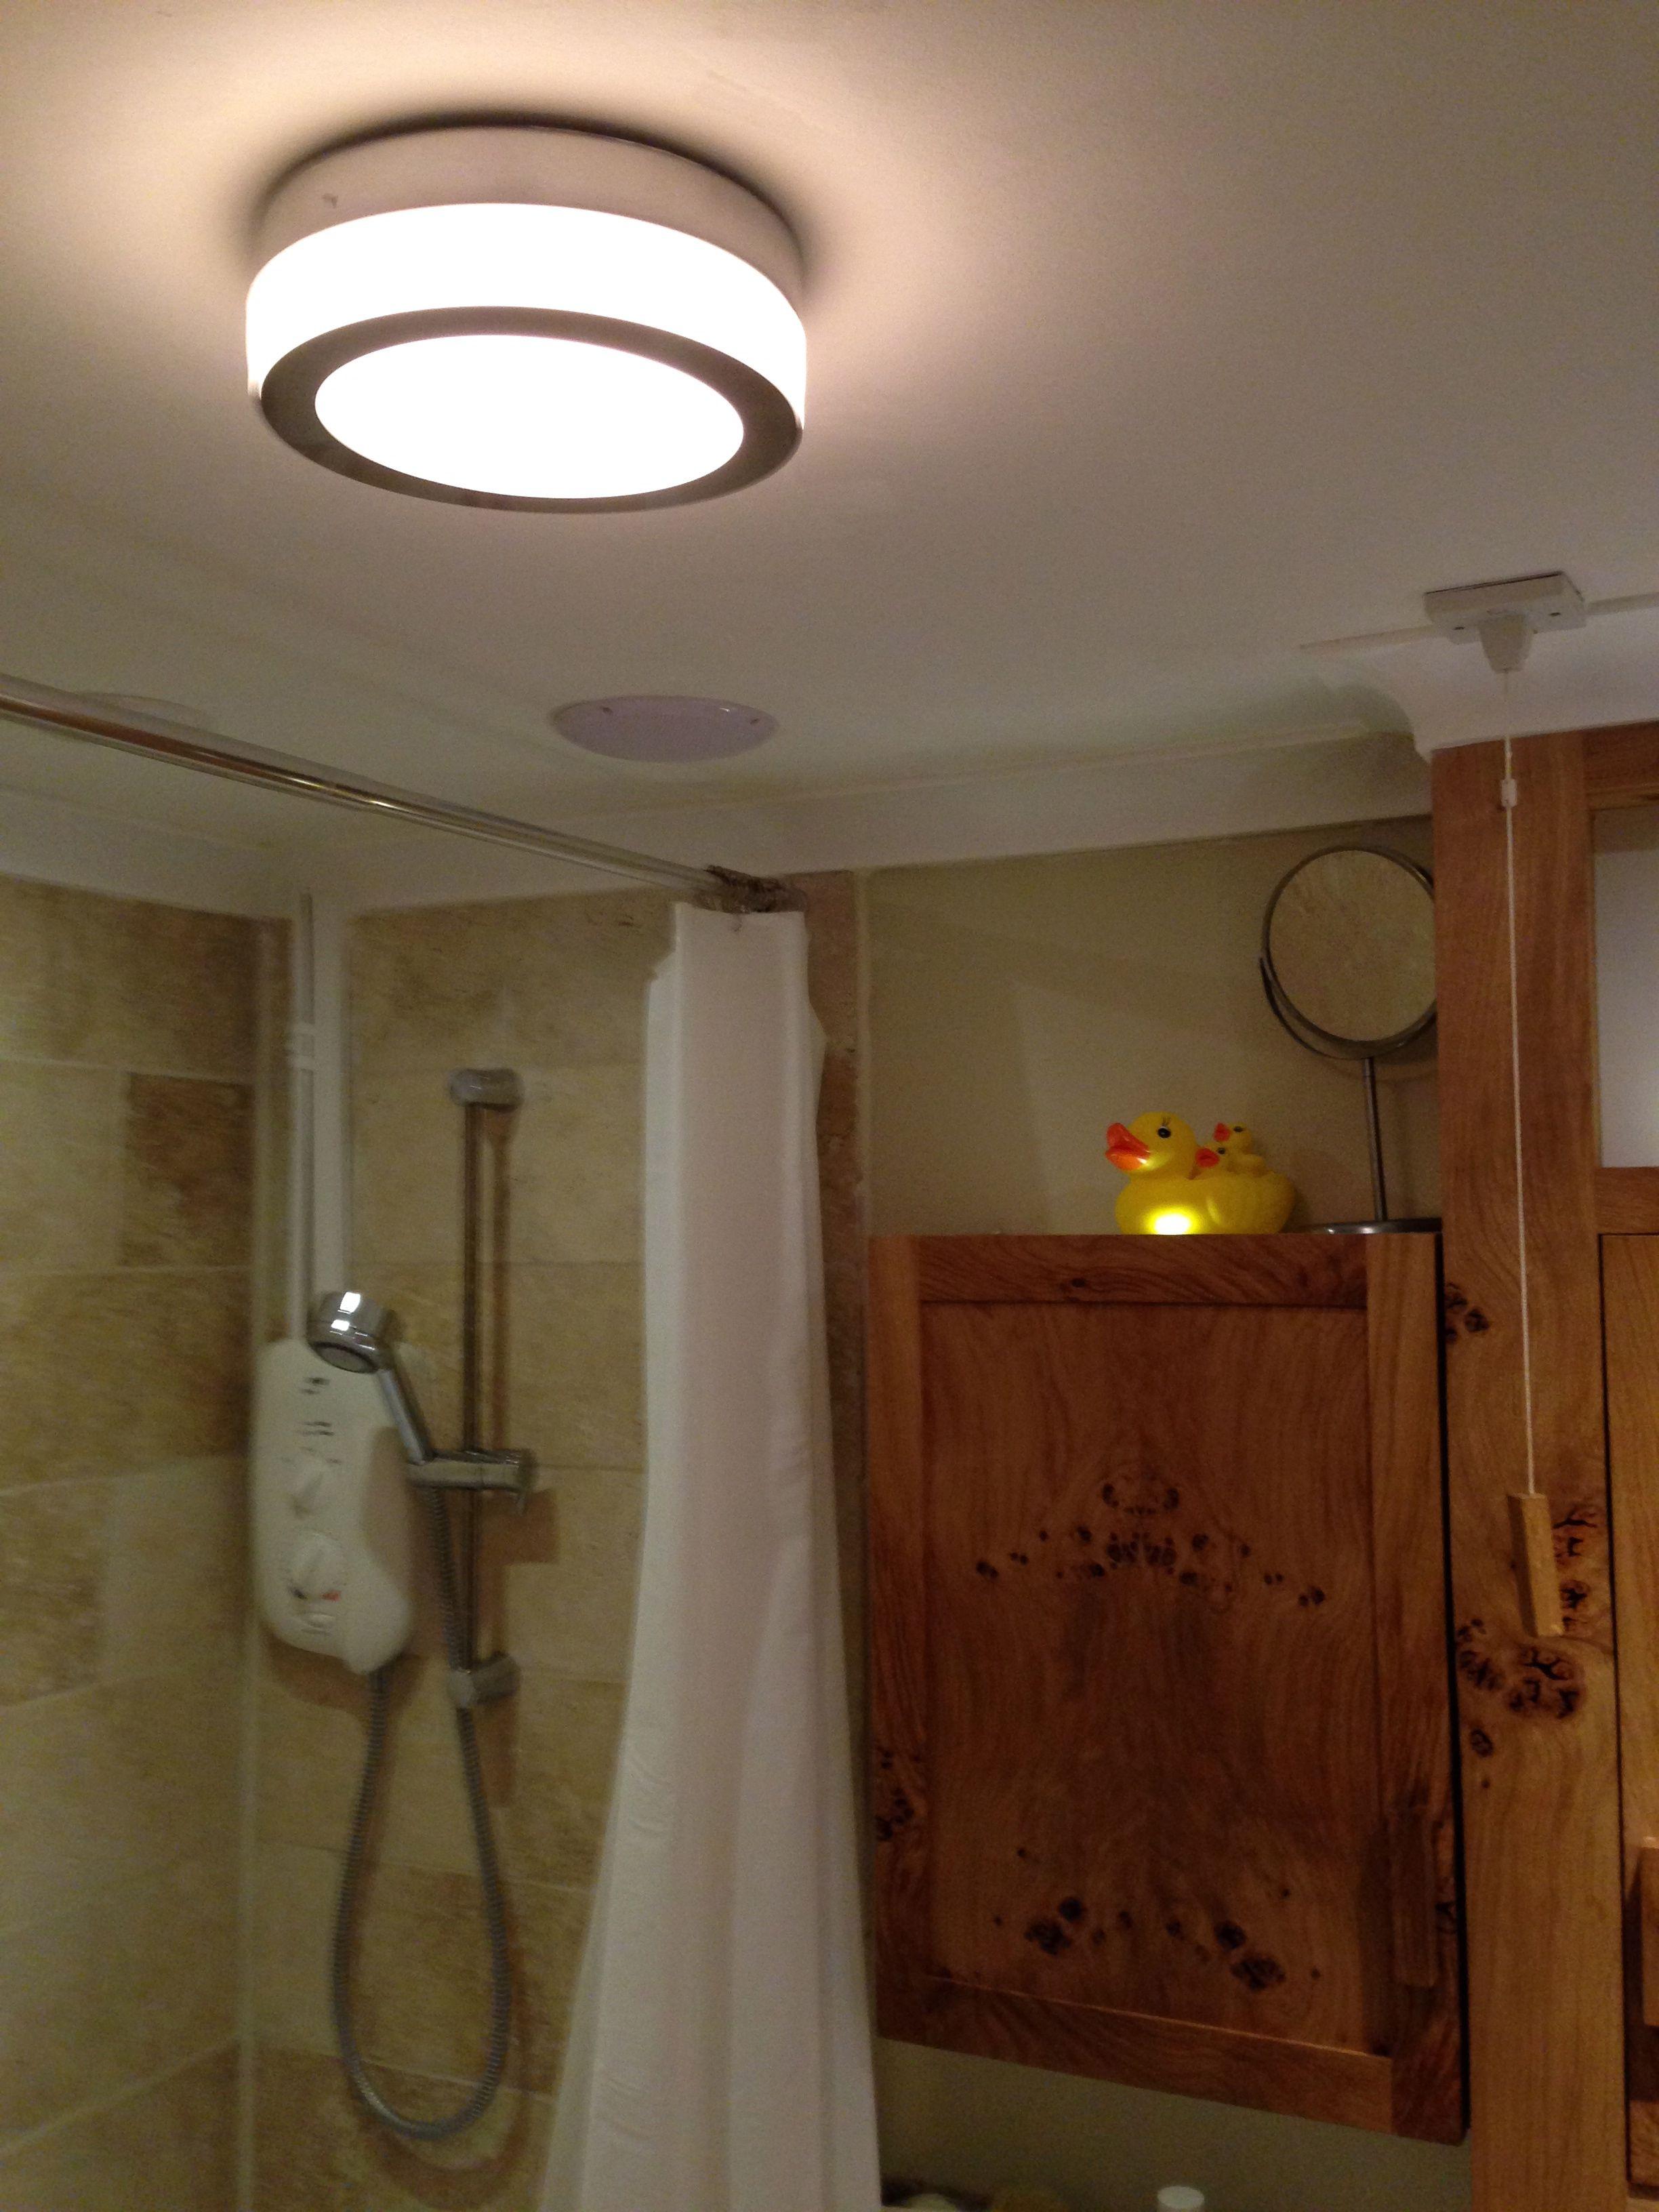 Bathroom ceiling speakers - Bathroom Central Ceiling Light Fitting Ceiling Speakers Coving And Travertine Tiled Walls